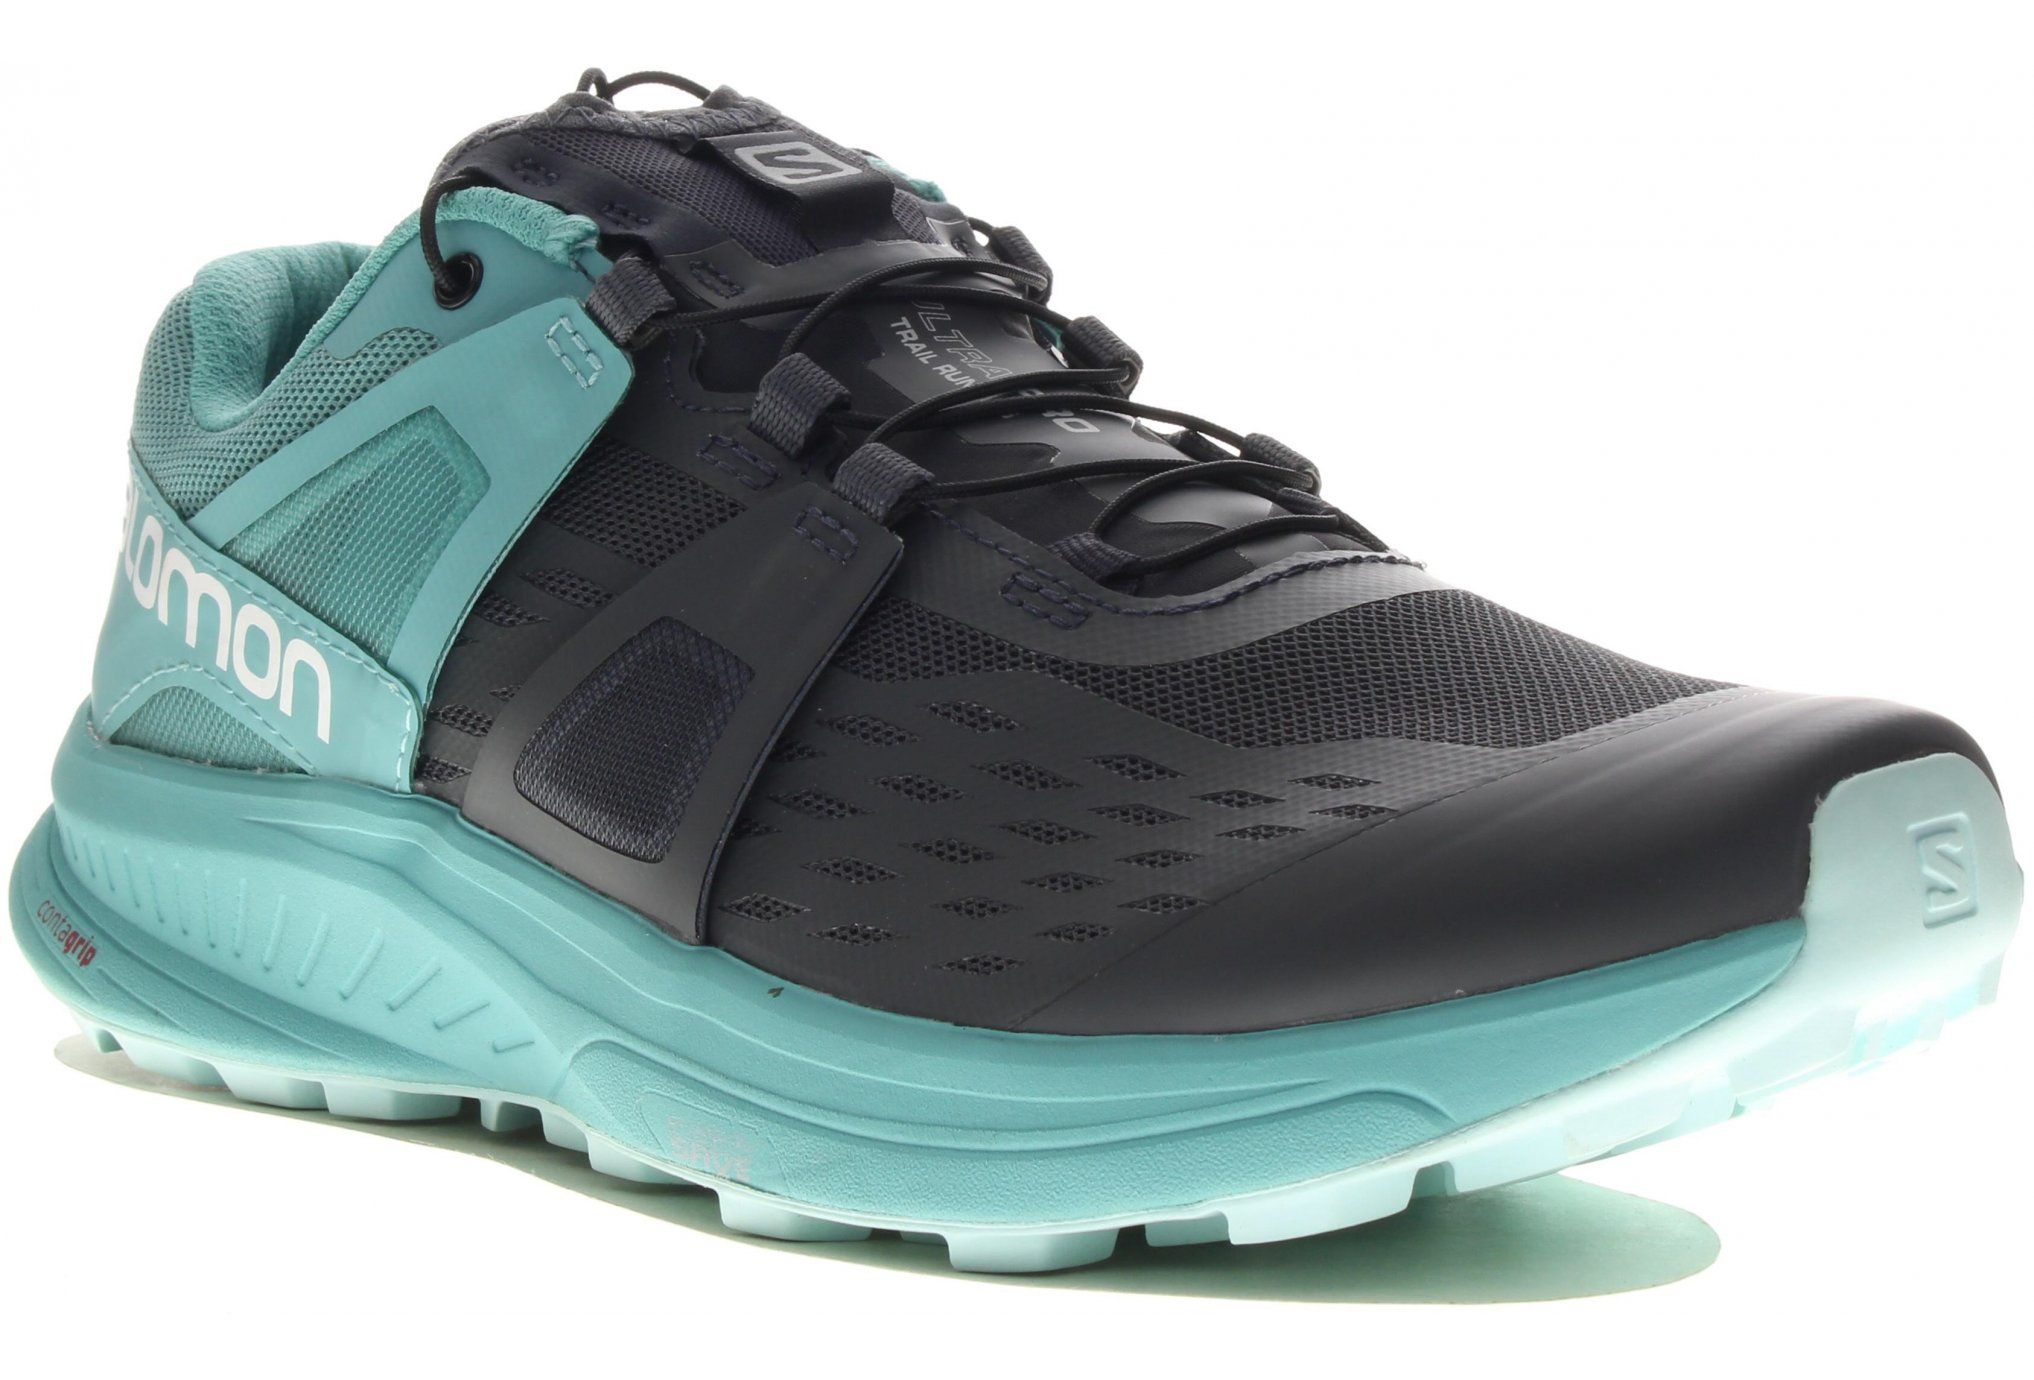 Salomon Ultra Pro Chaussures running femme